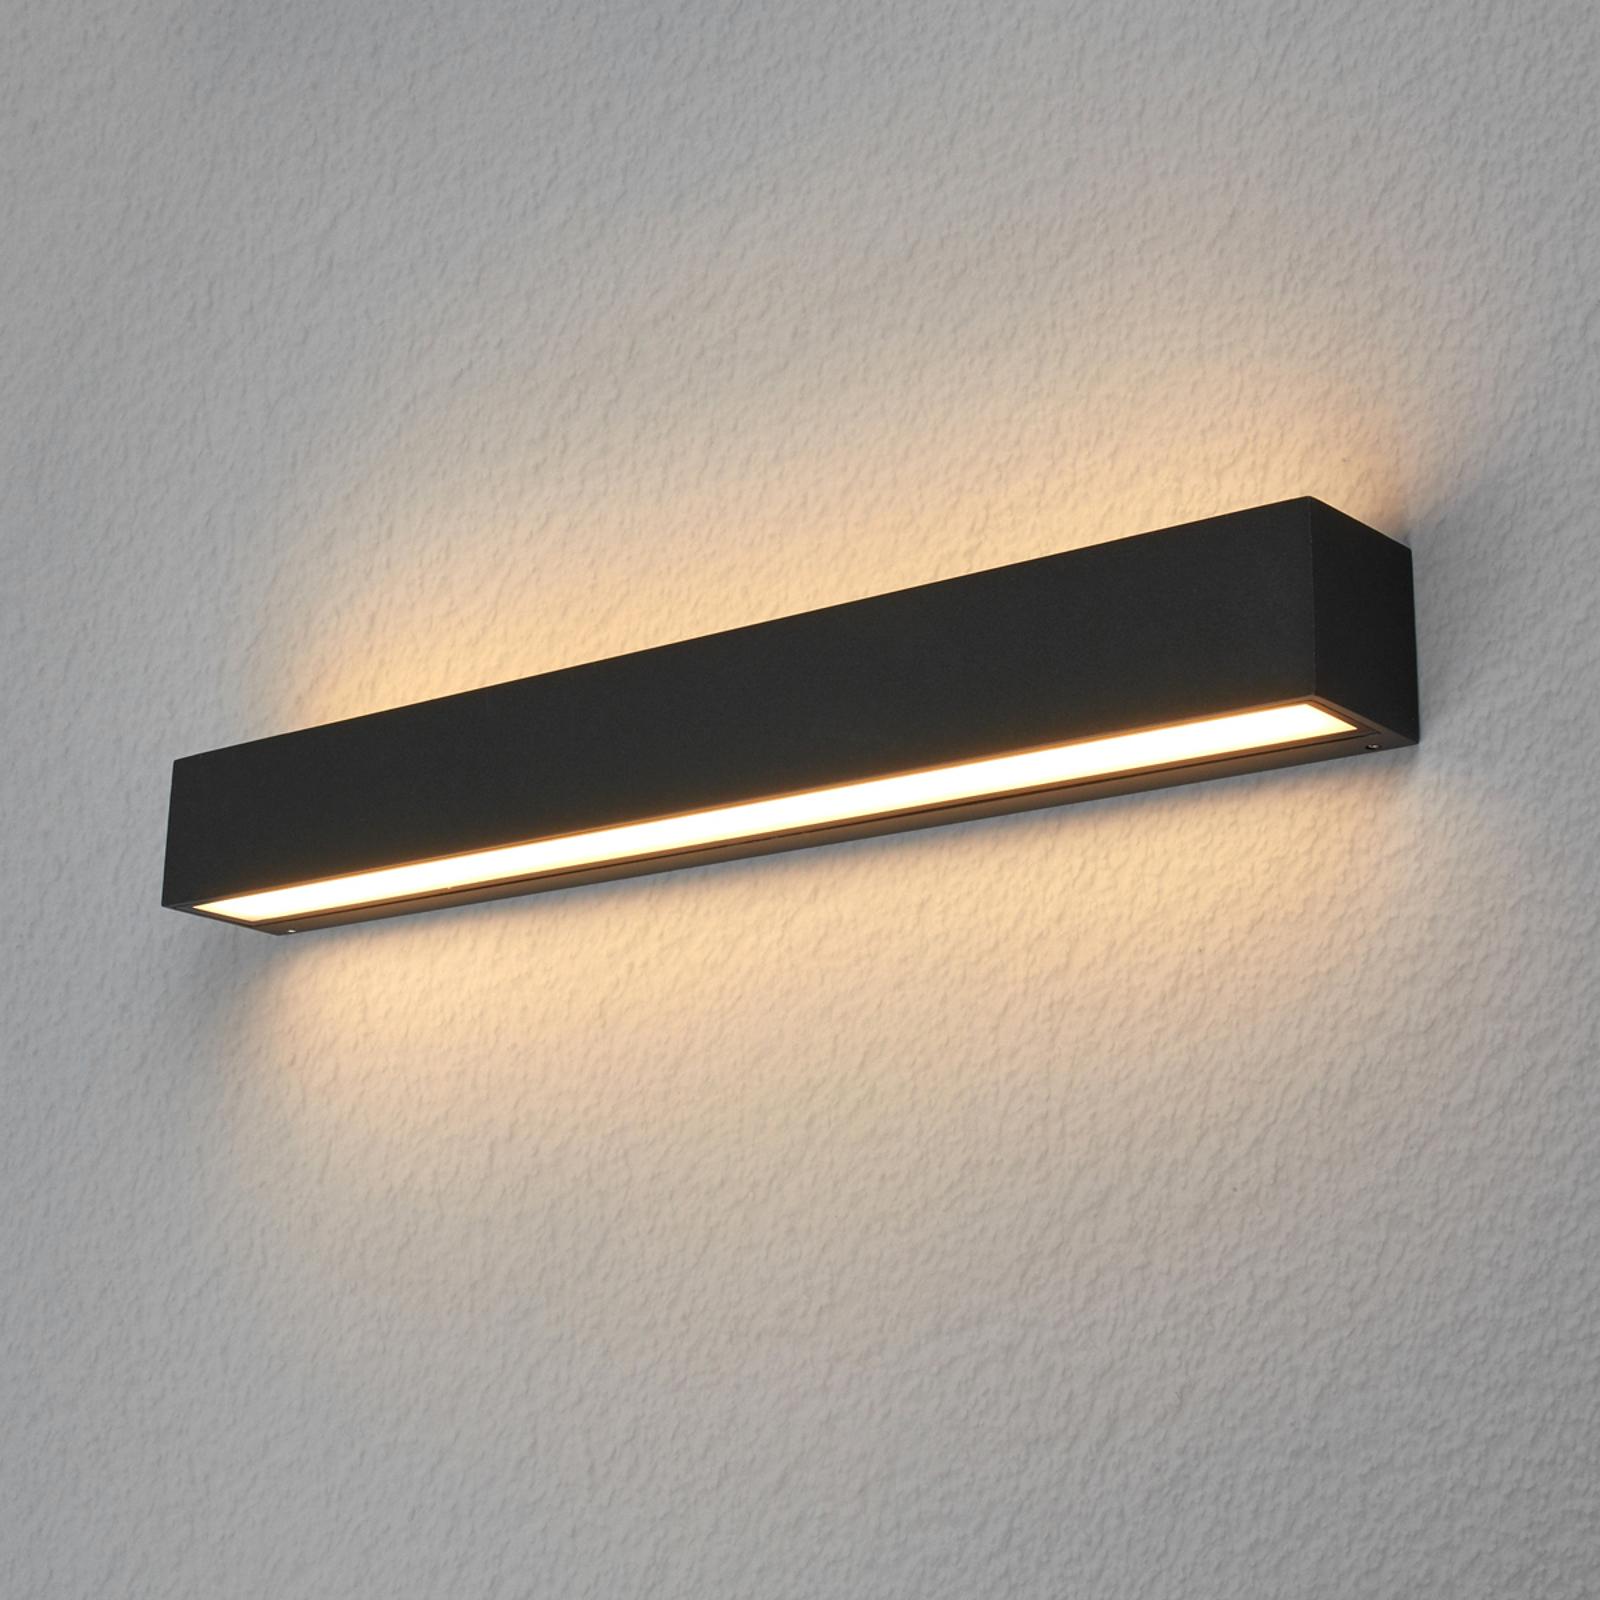 Lucande Lengo applique LED, 50 cm, grafite, 2 luci